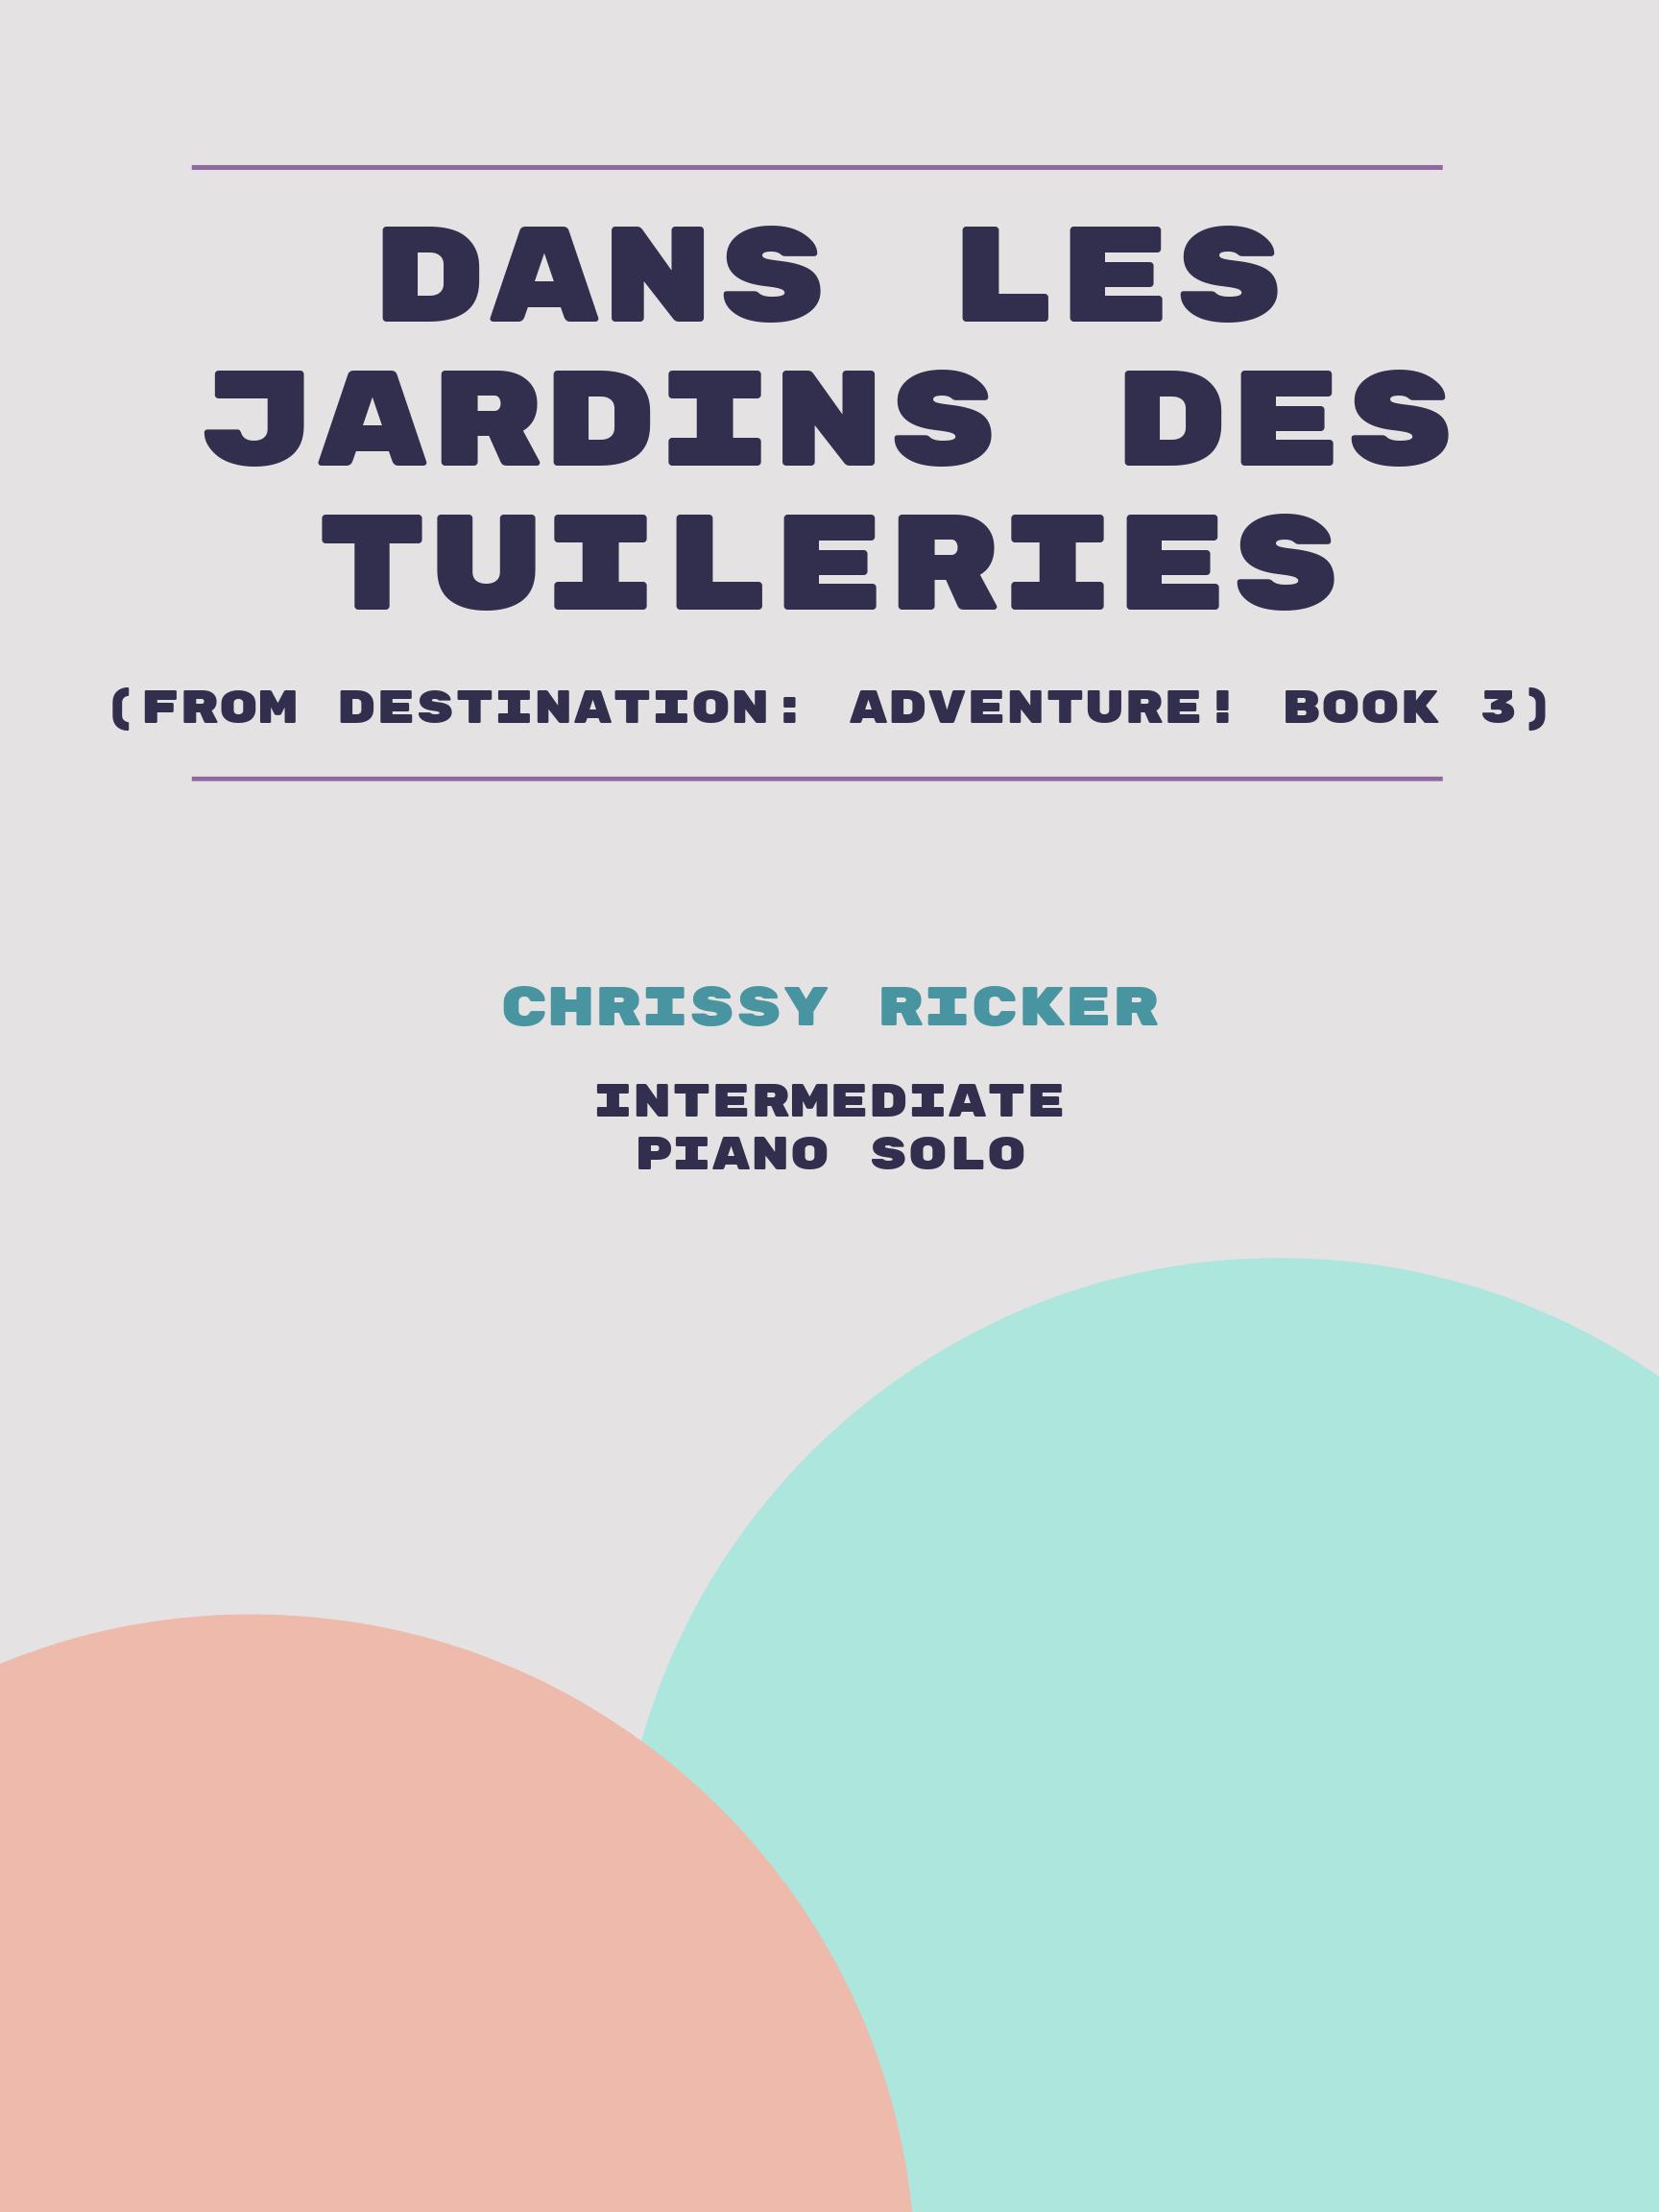 Dans les jardins des Tuileries by Chrissy Ricker